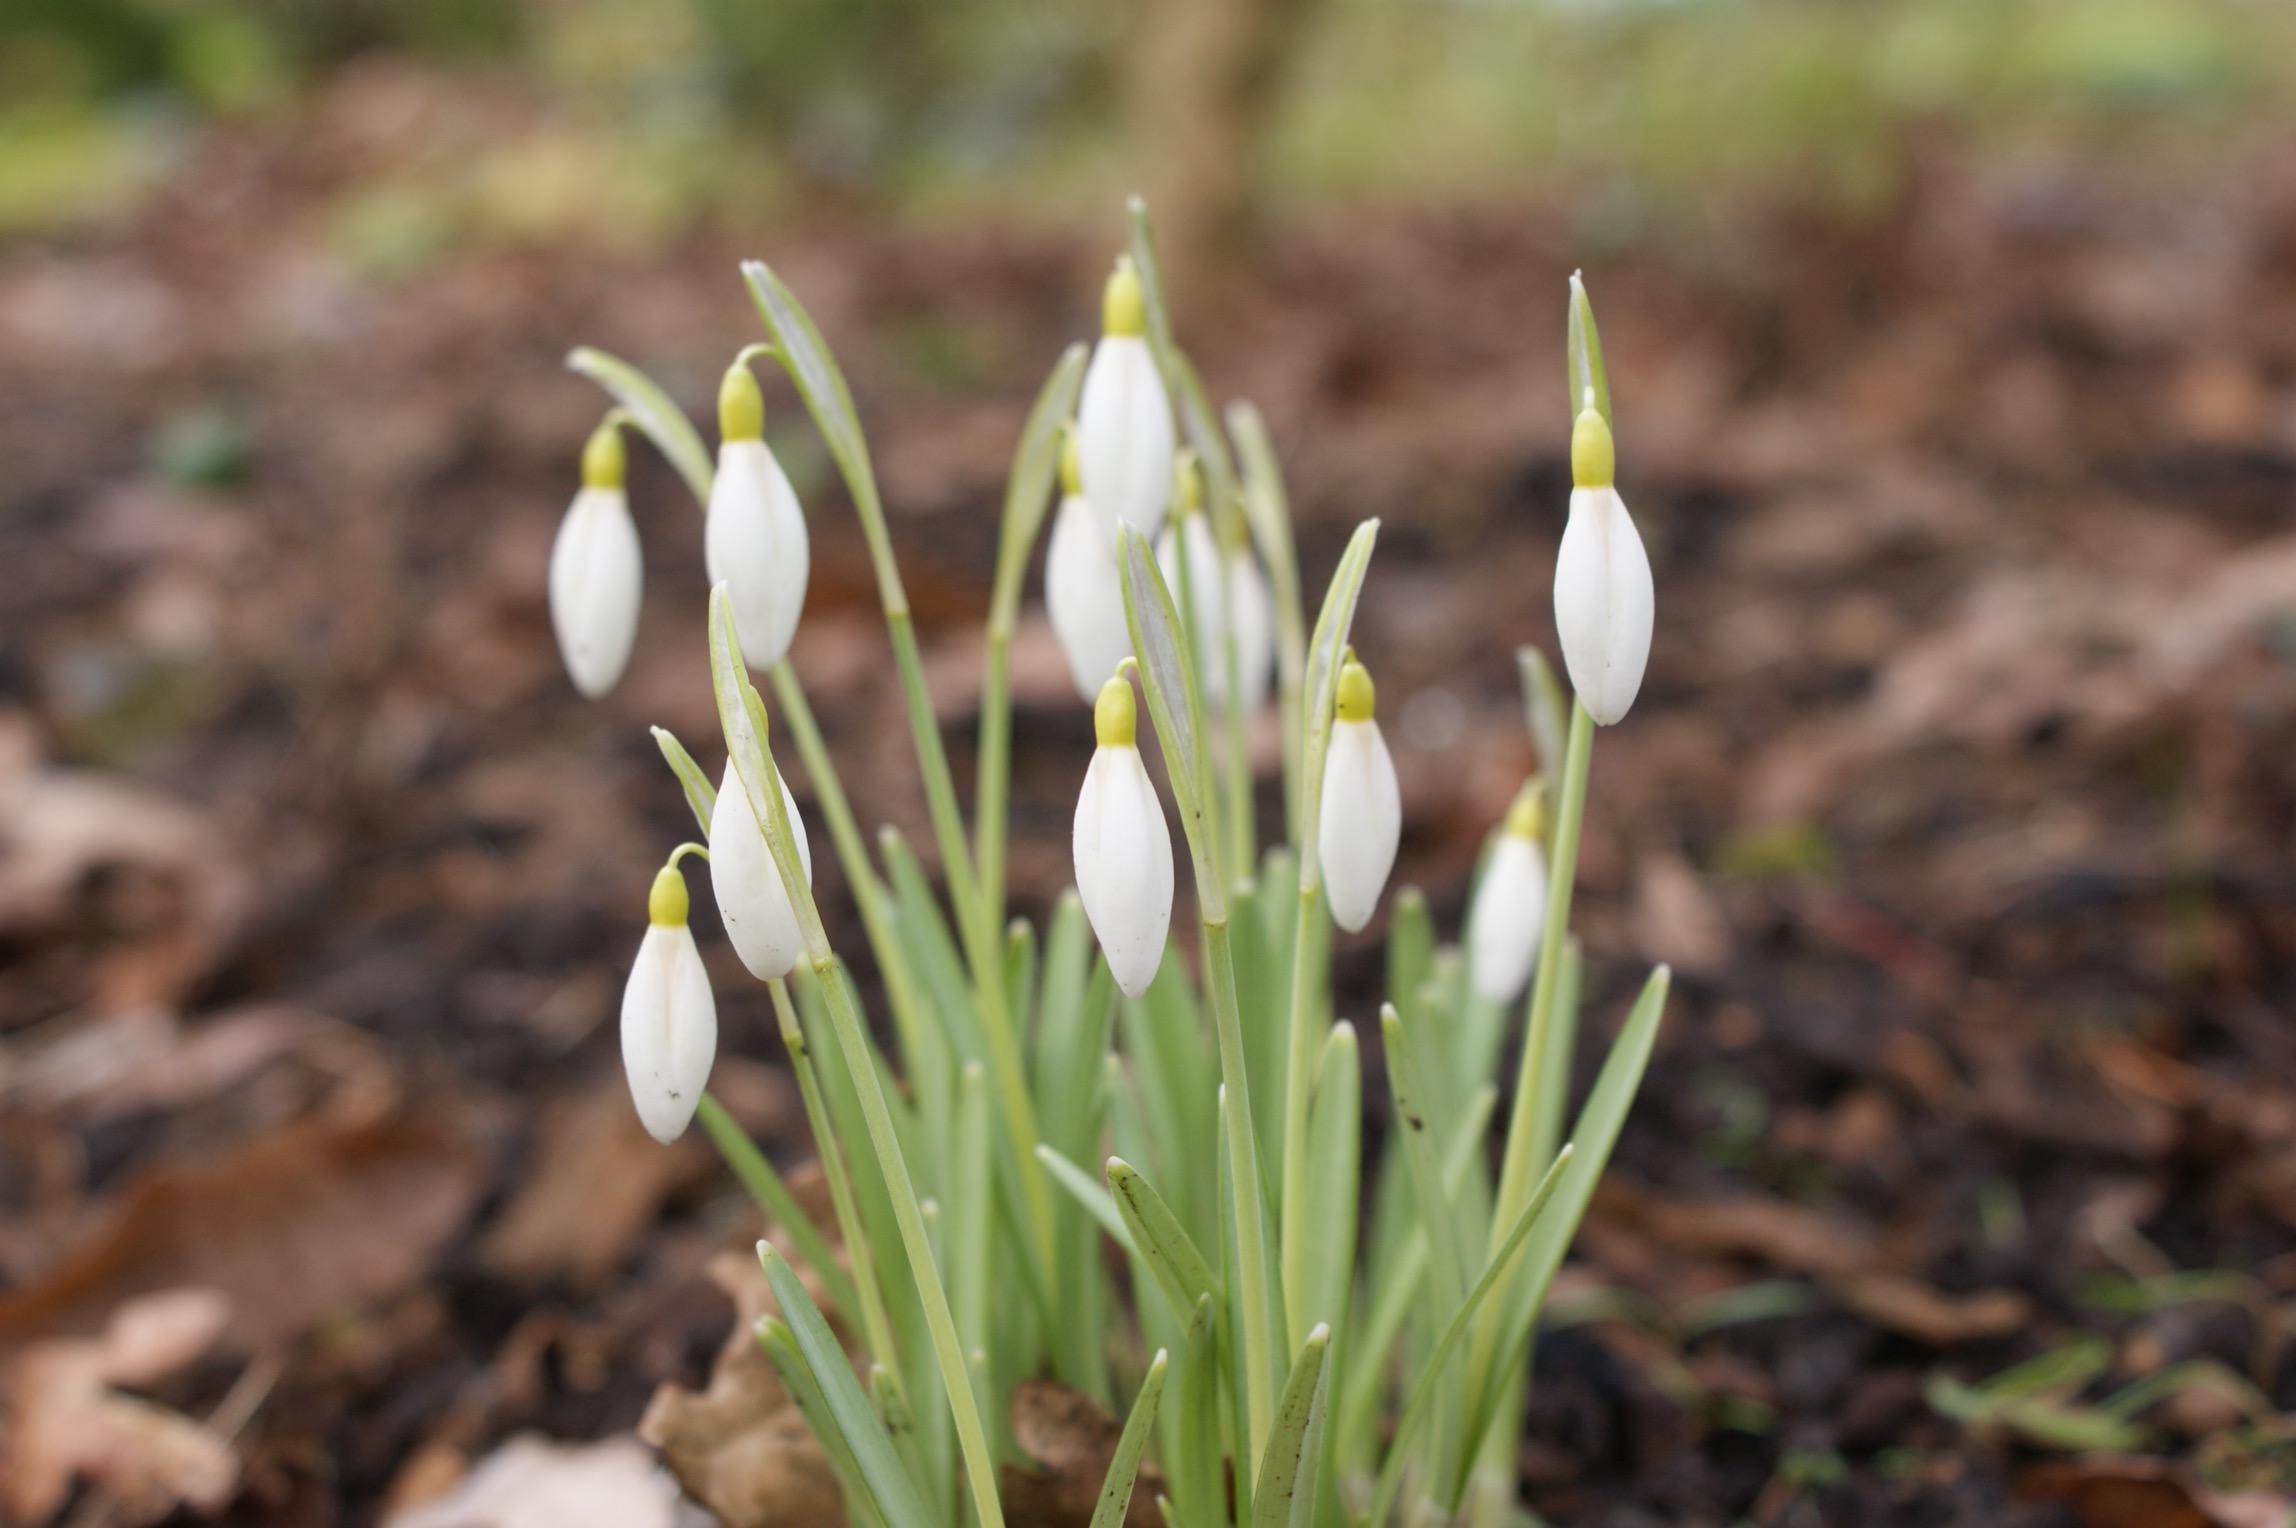 galanthus_nivalis_norfolk_blonde_morlas_plants